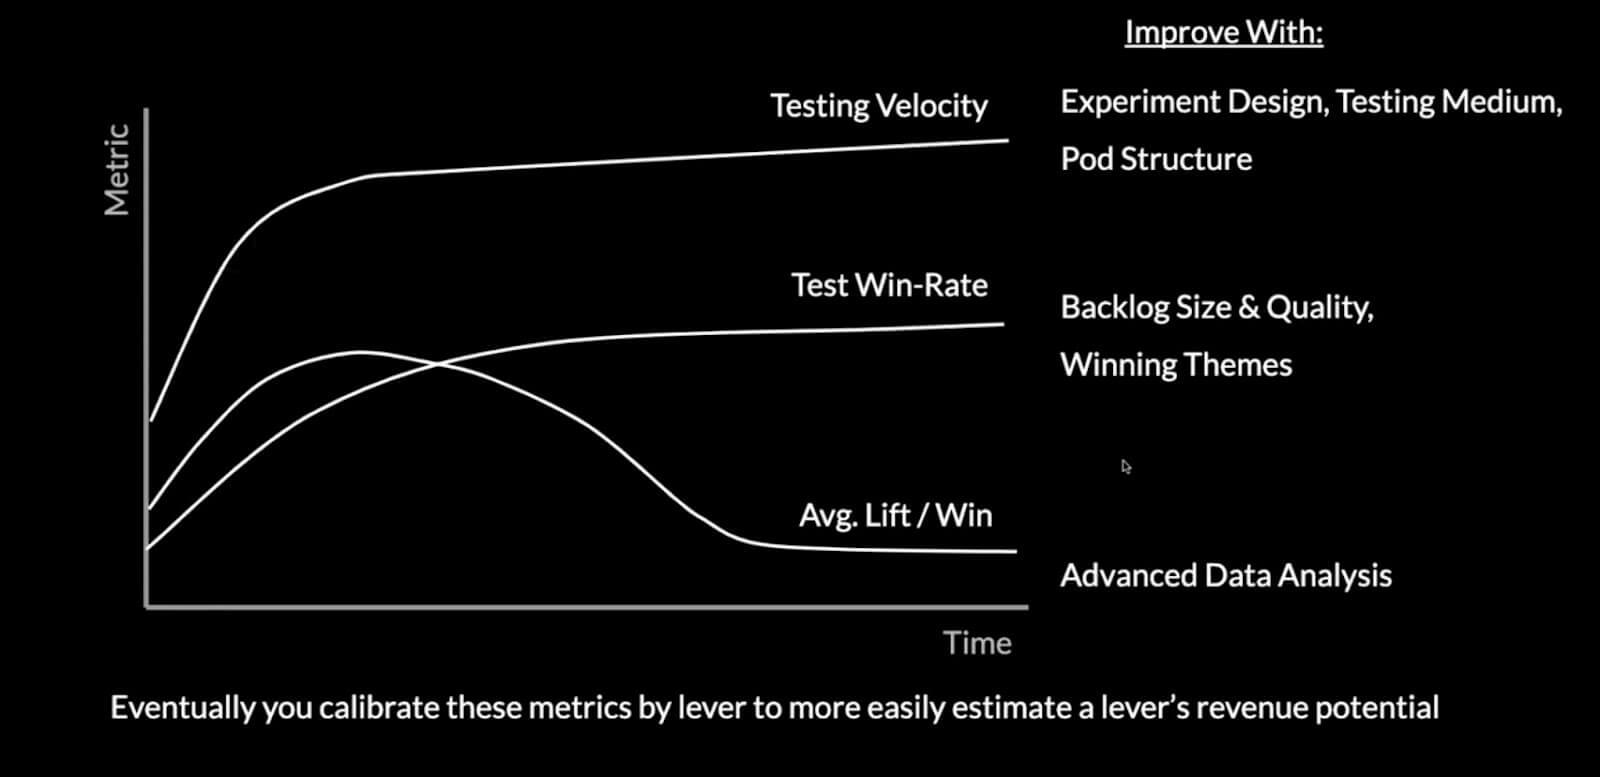 testing velocity increase